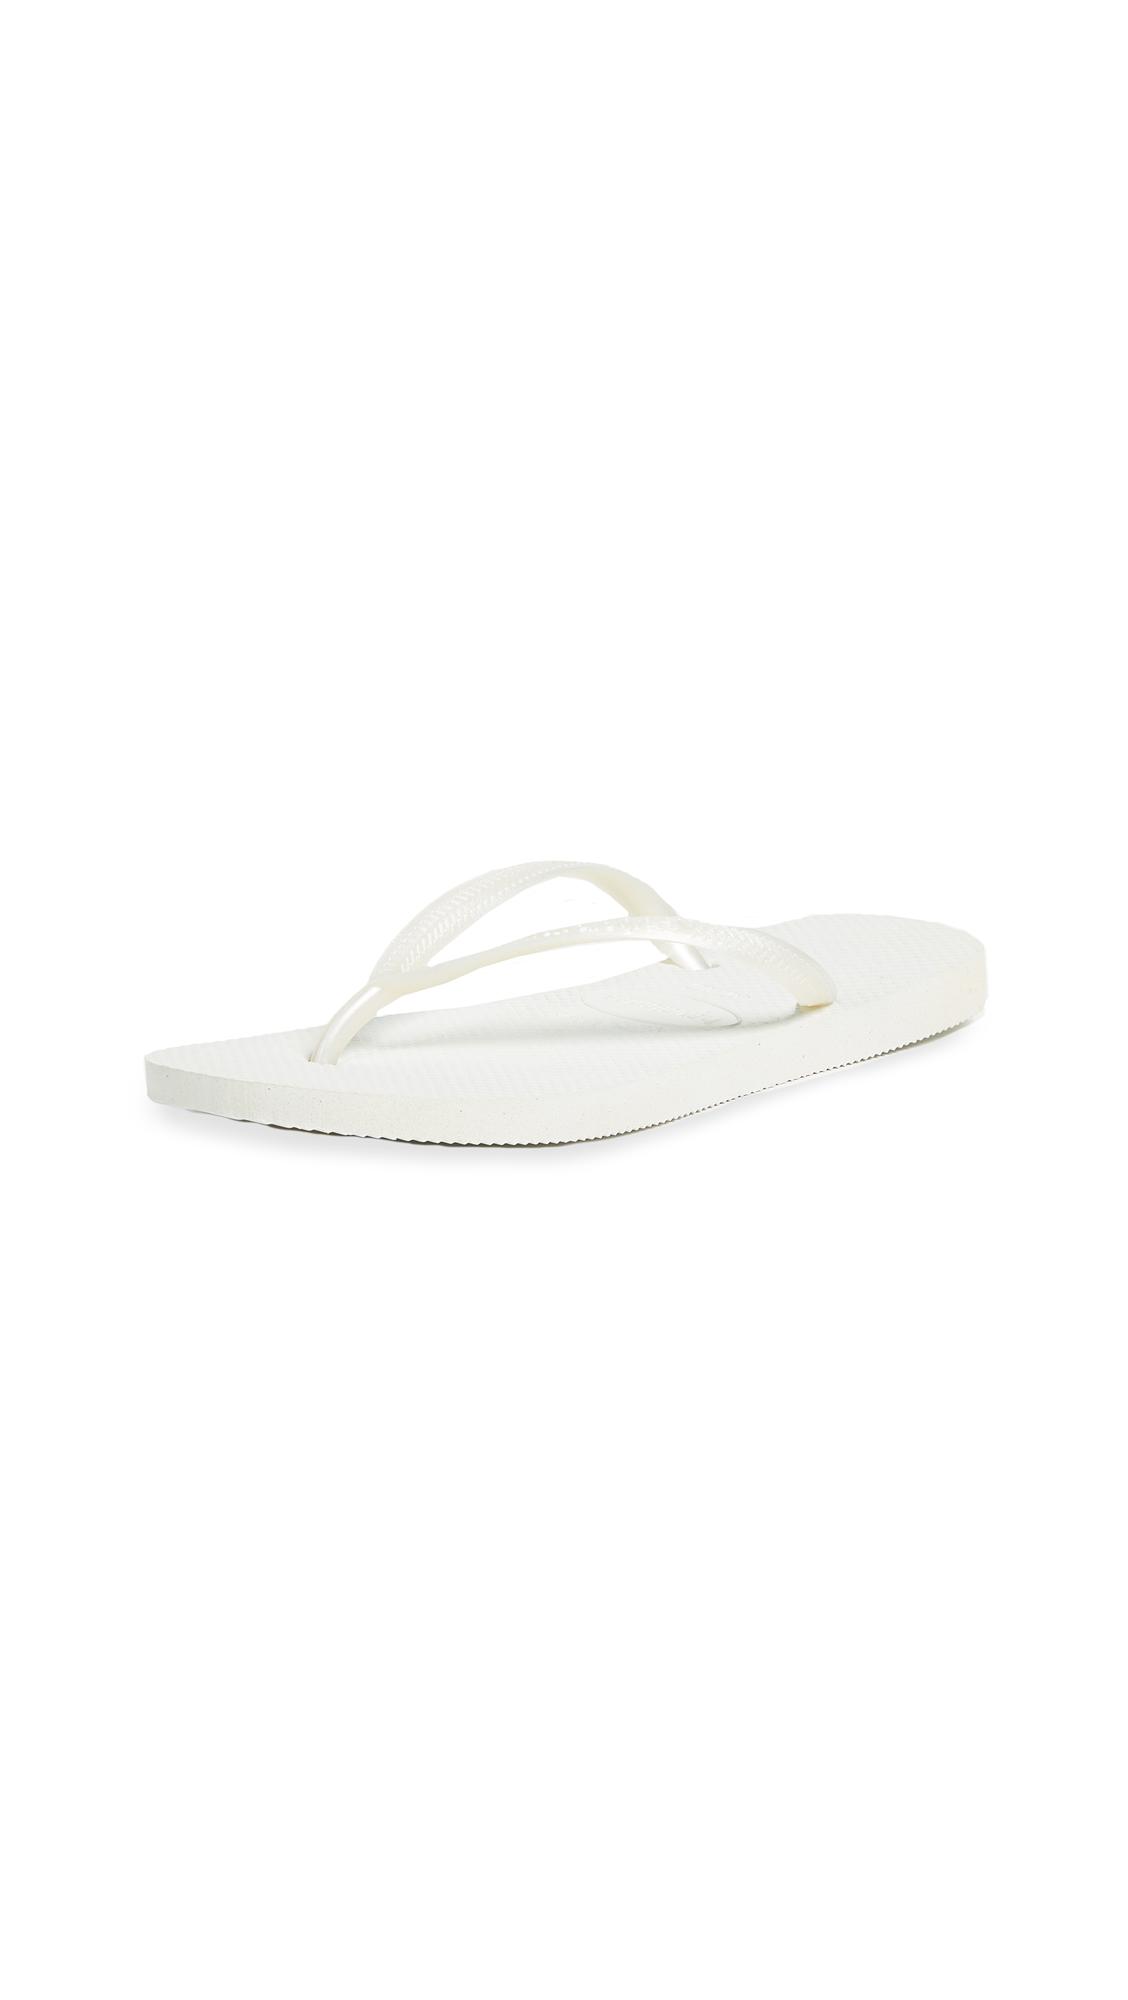 Havaianas Slim Flip Flops - White